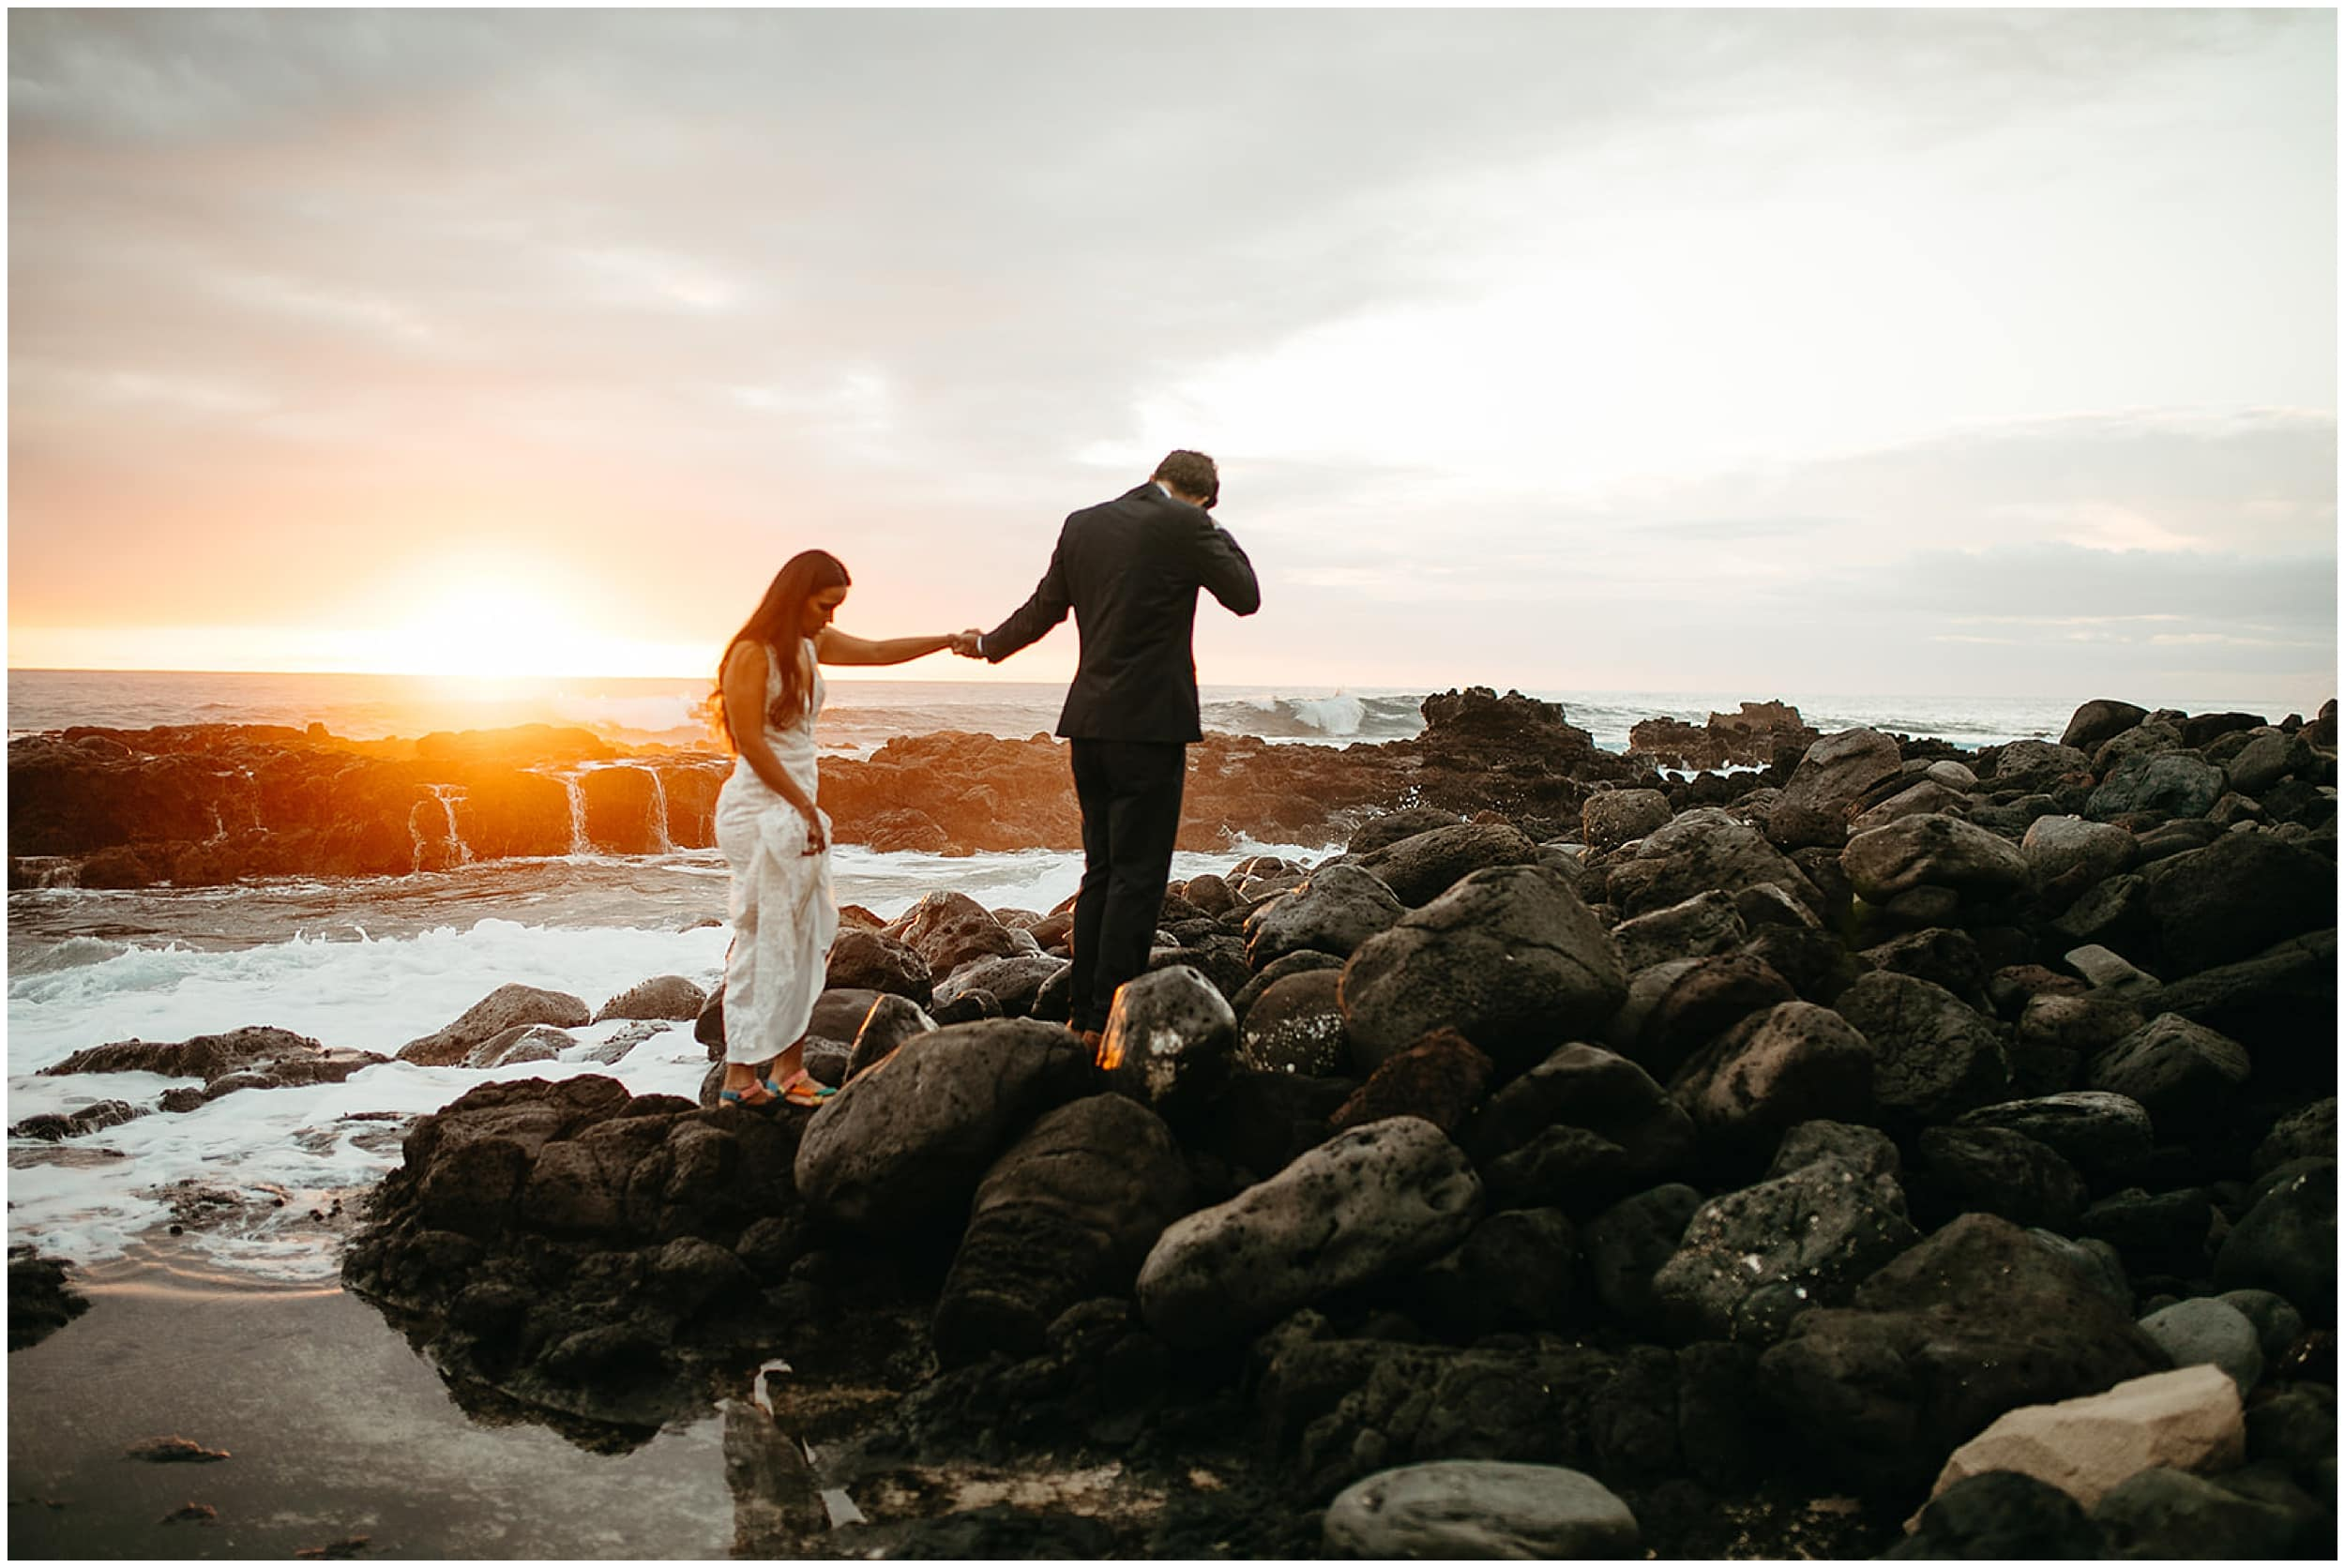 bride and groom walking on beach at sunrise